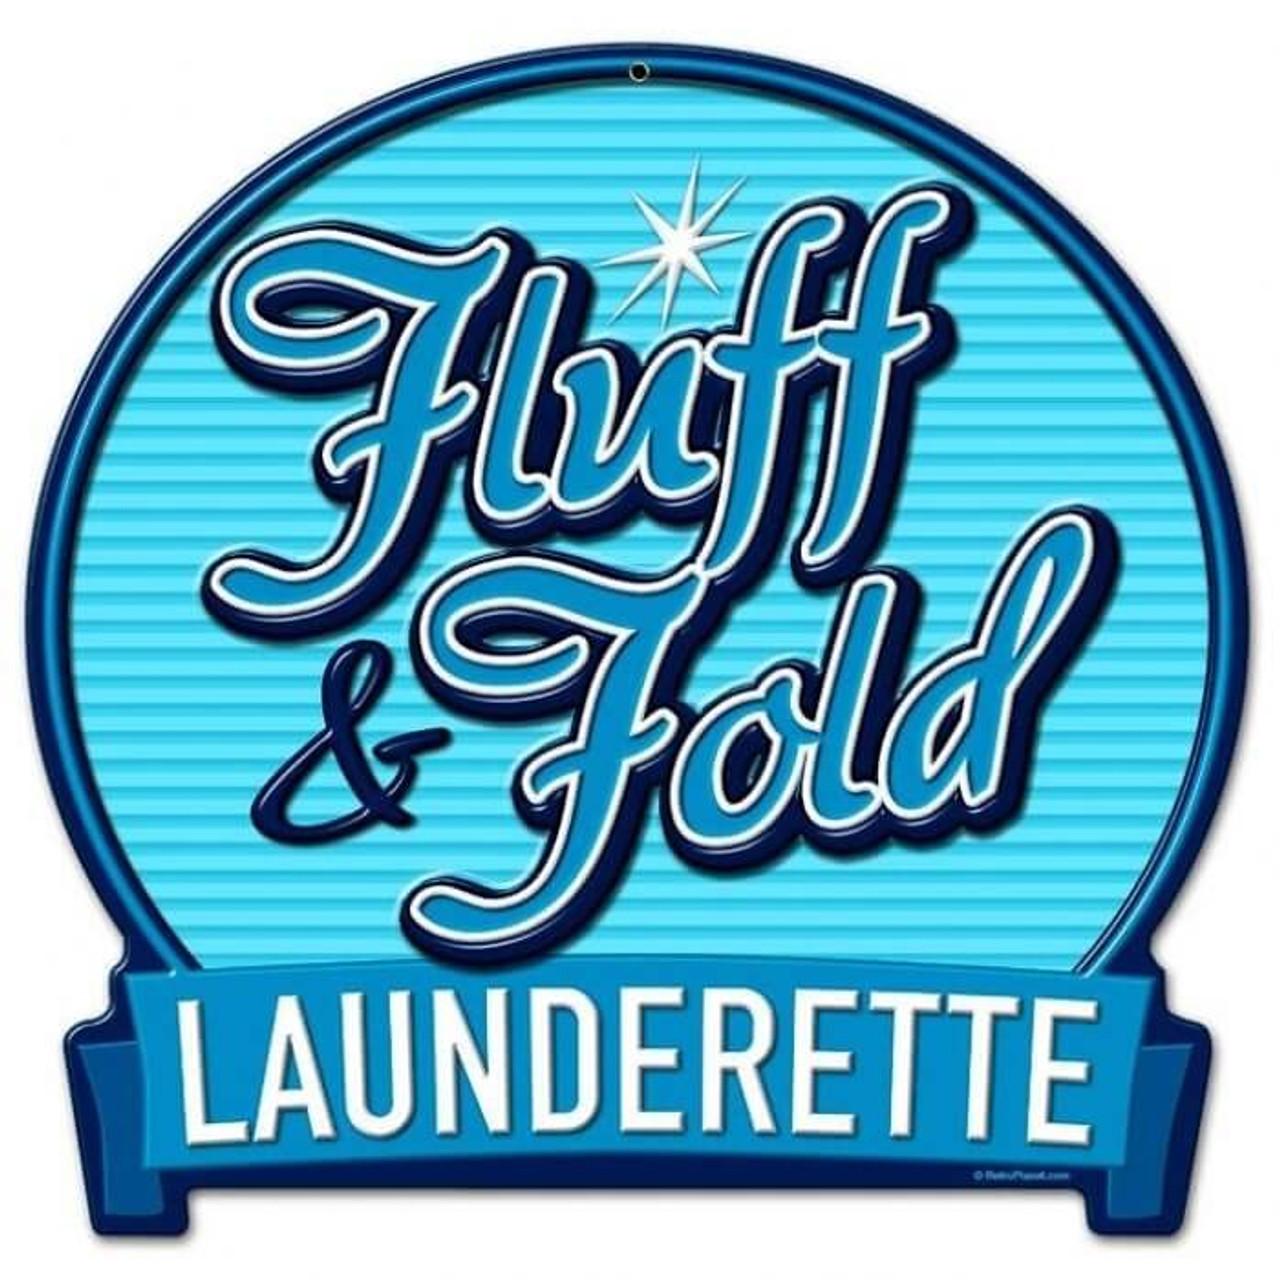 Retro Fluff Fold Round Banner Metal Sign